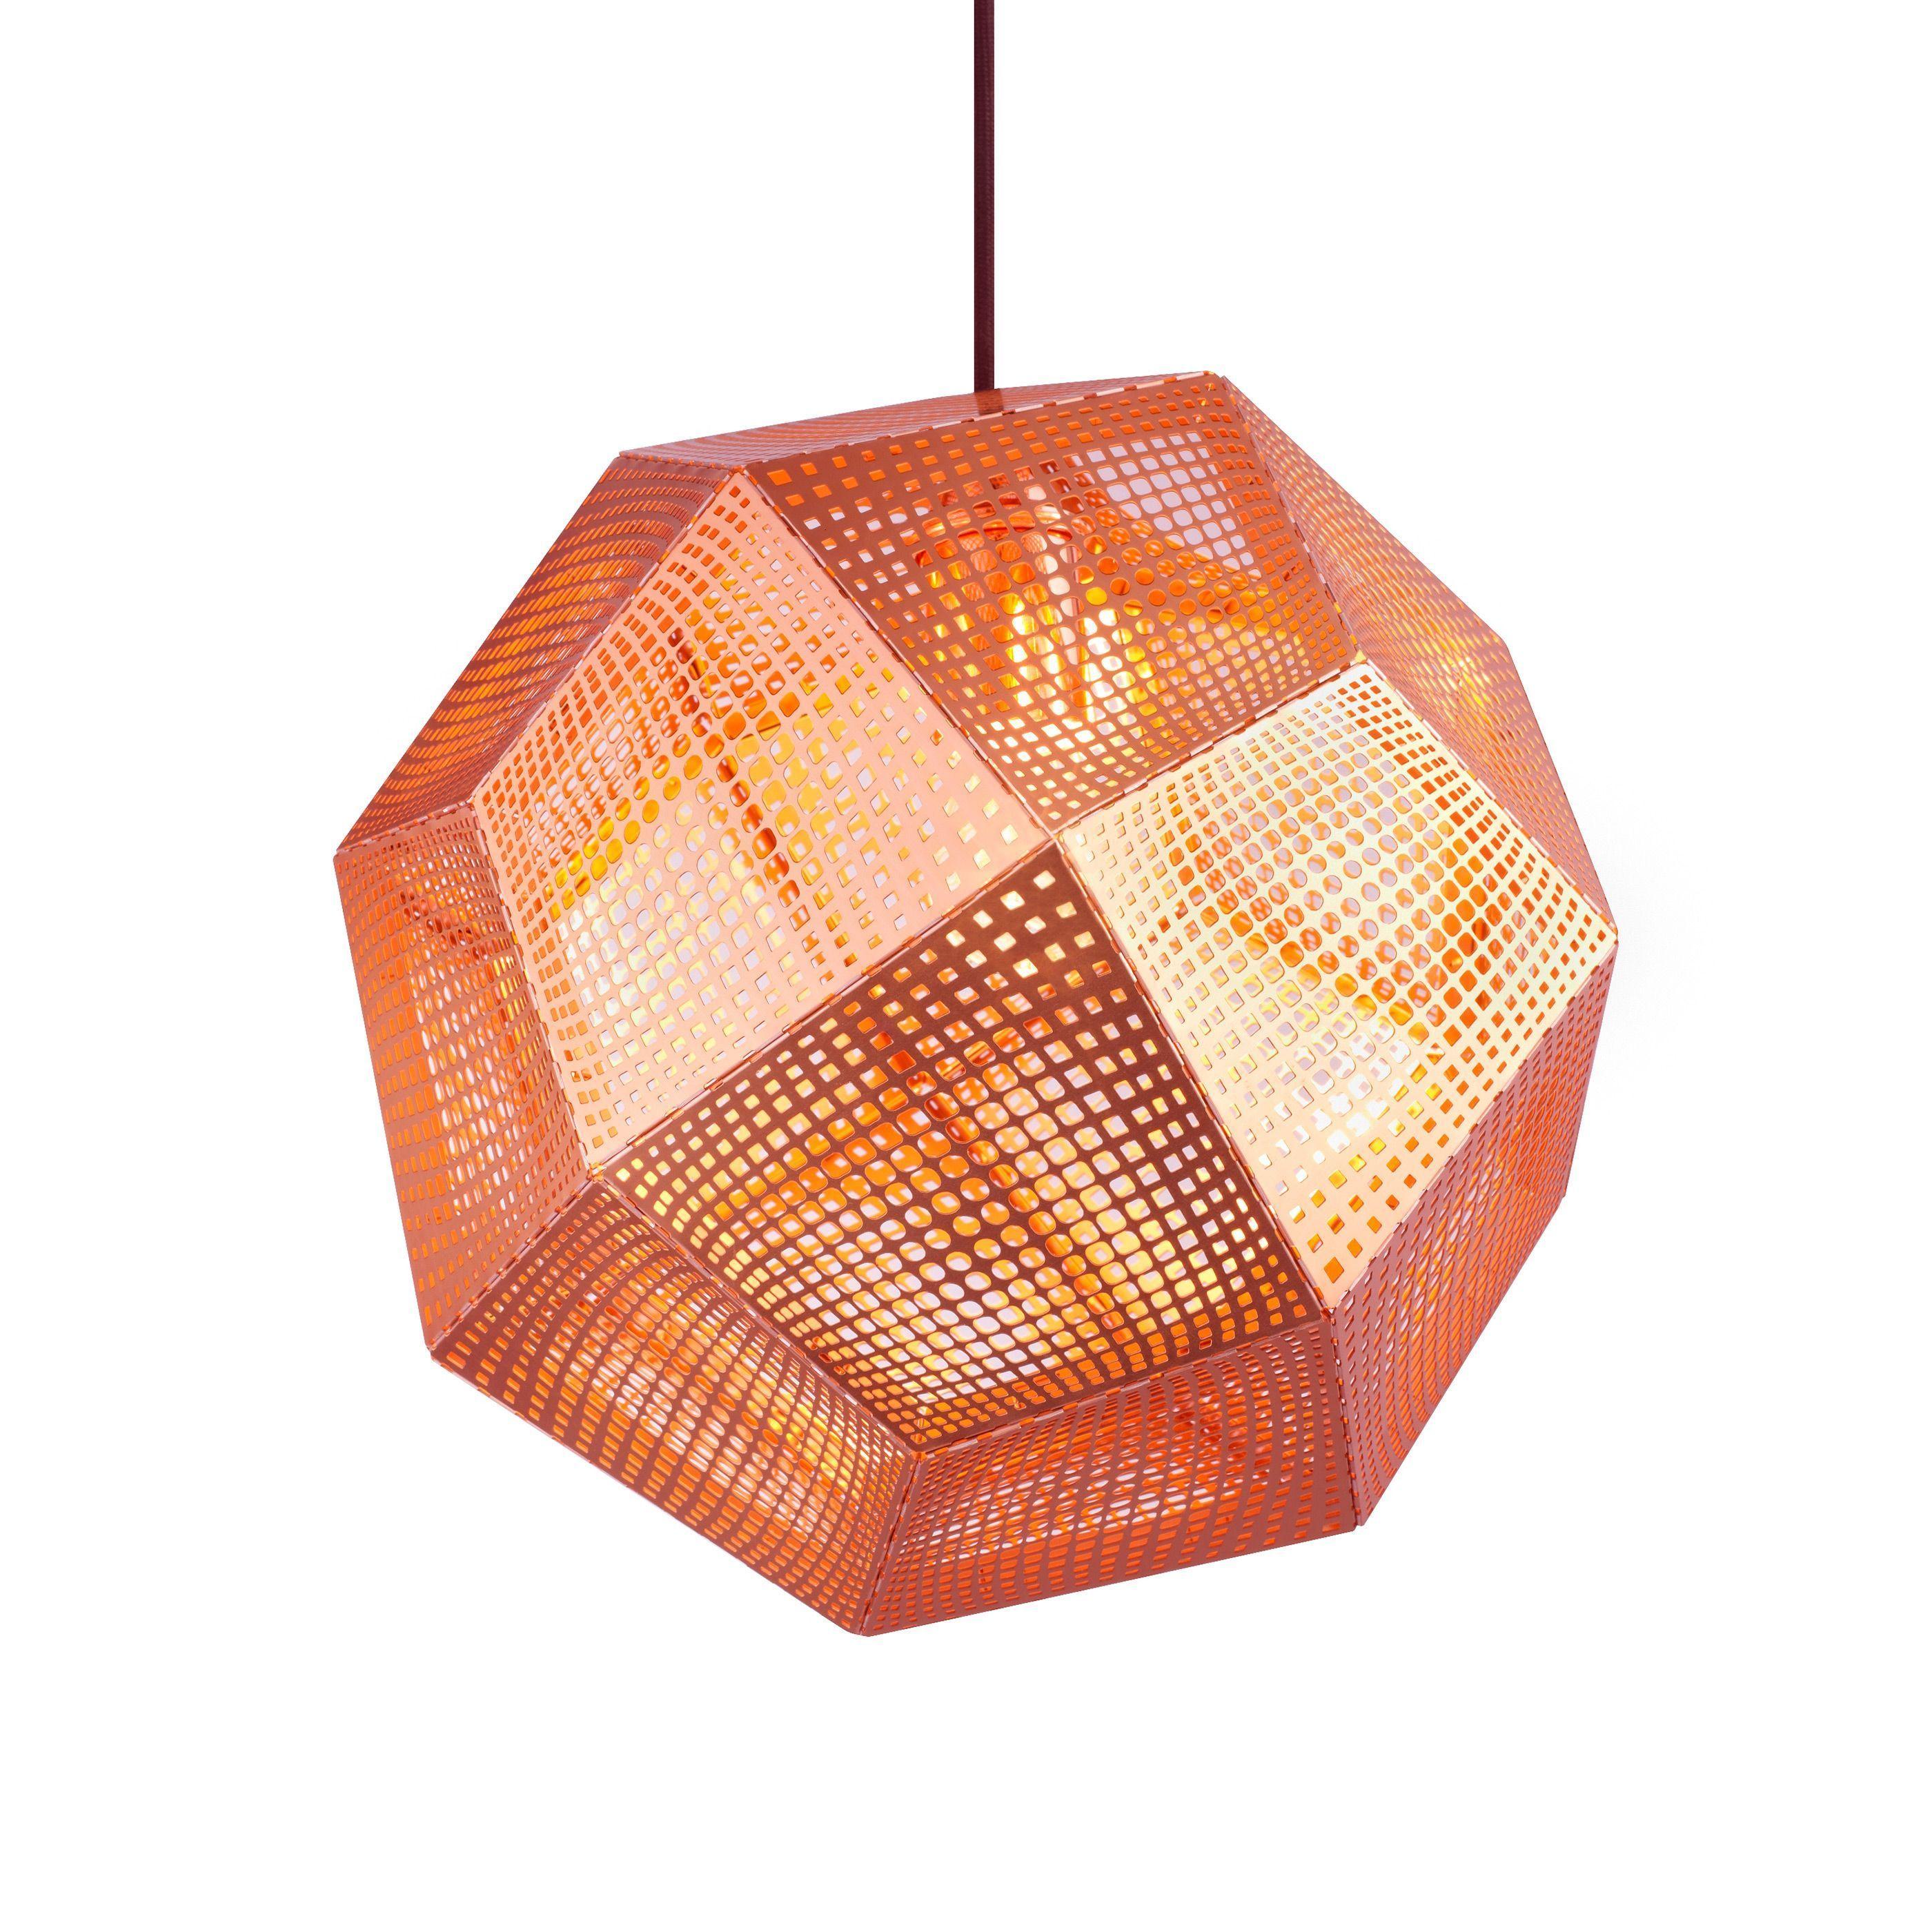 Tom Dixon Etch hanglamp 32 koper